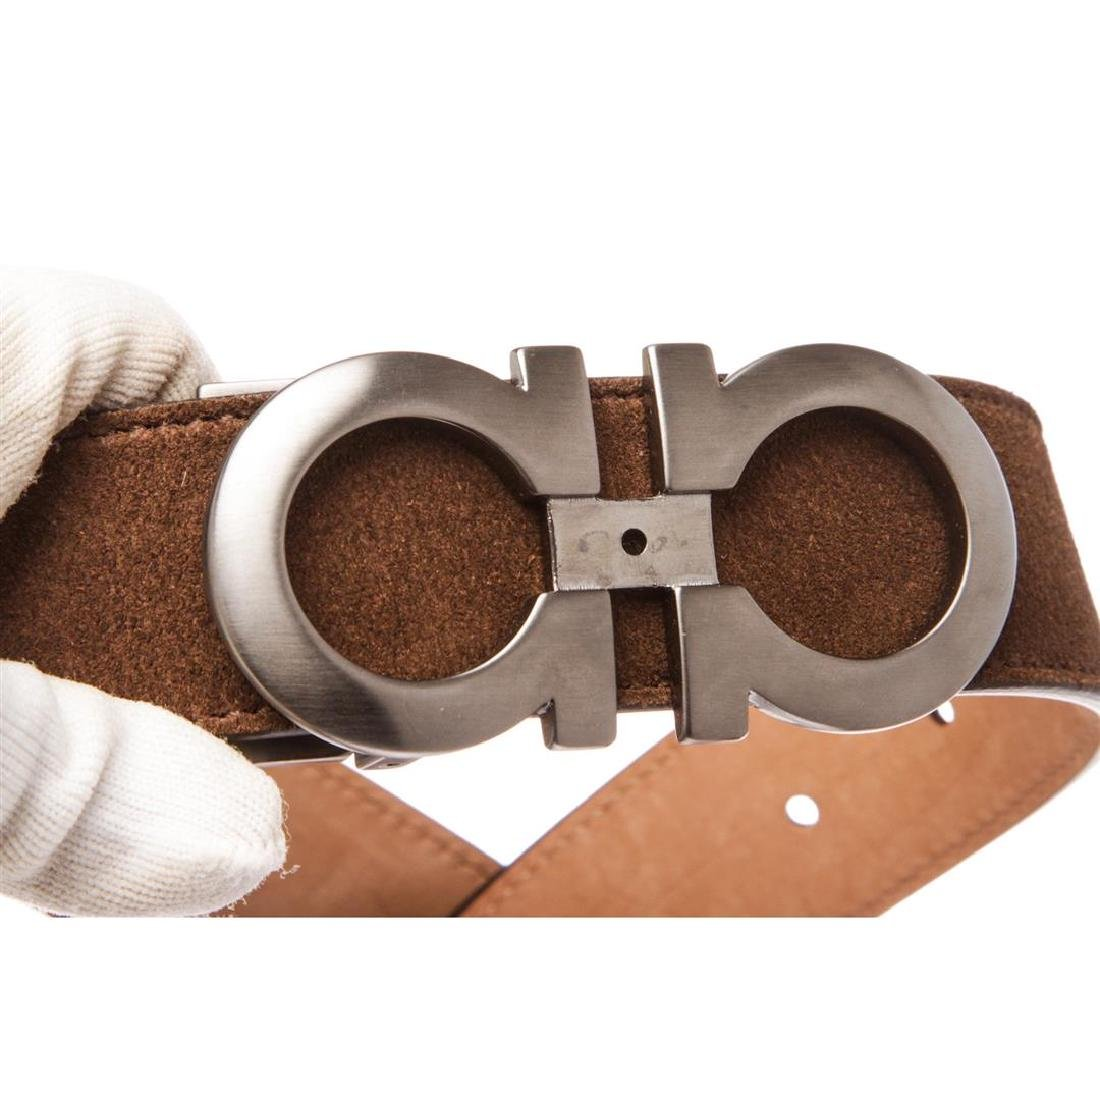 Salvatore Ferragamo Gancini Brown Leather Belt - 8